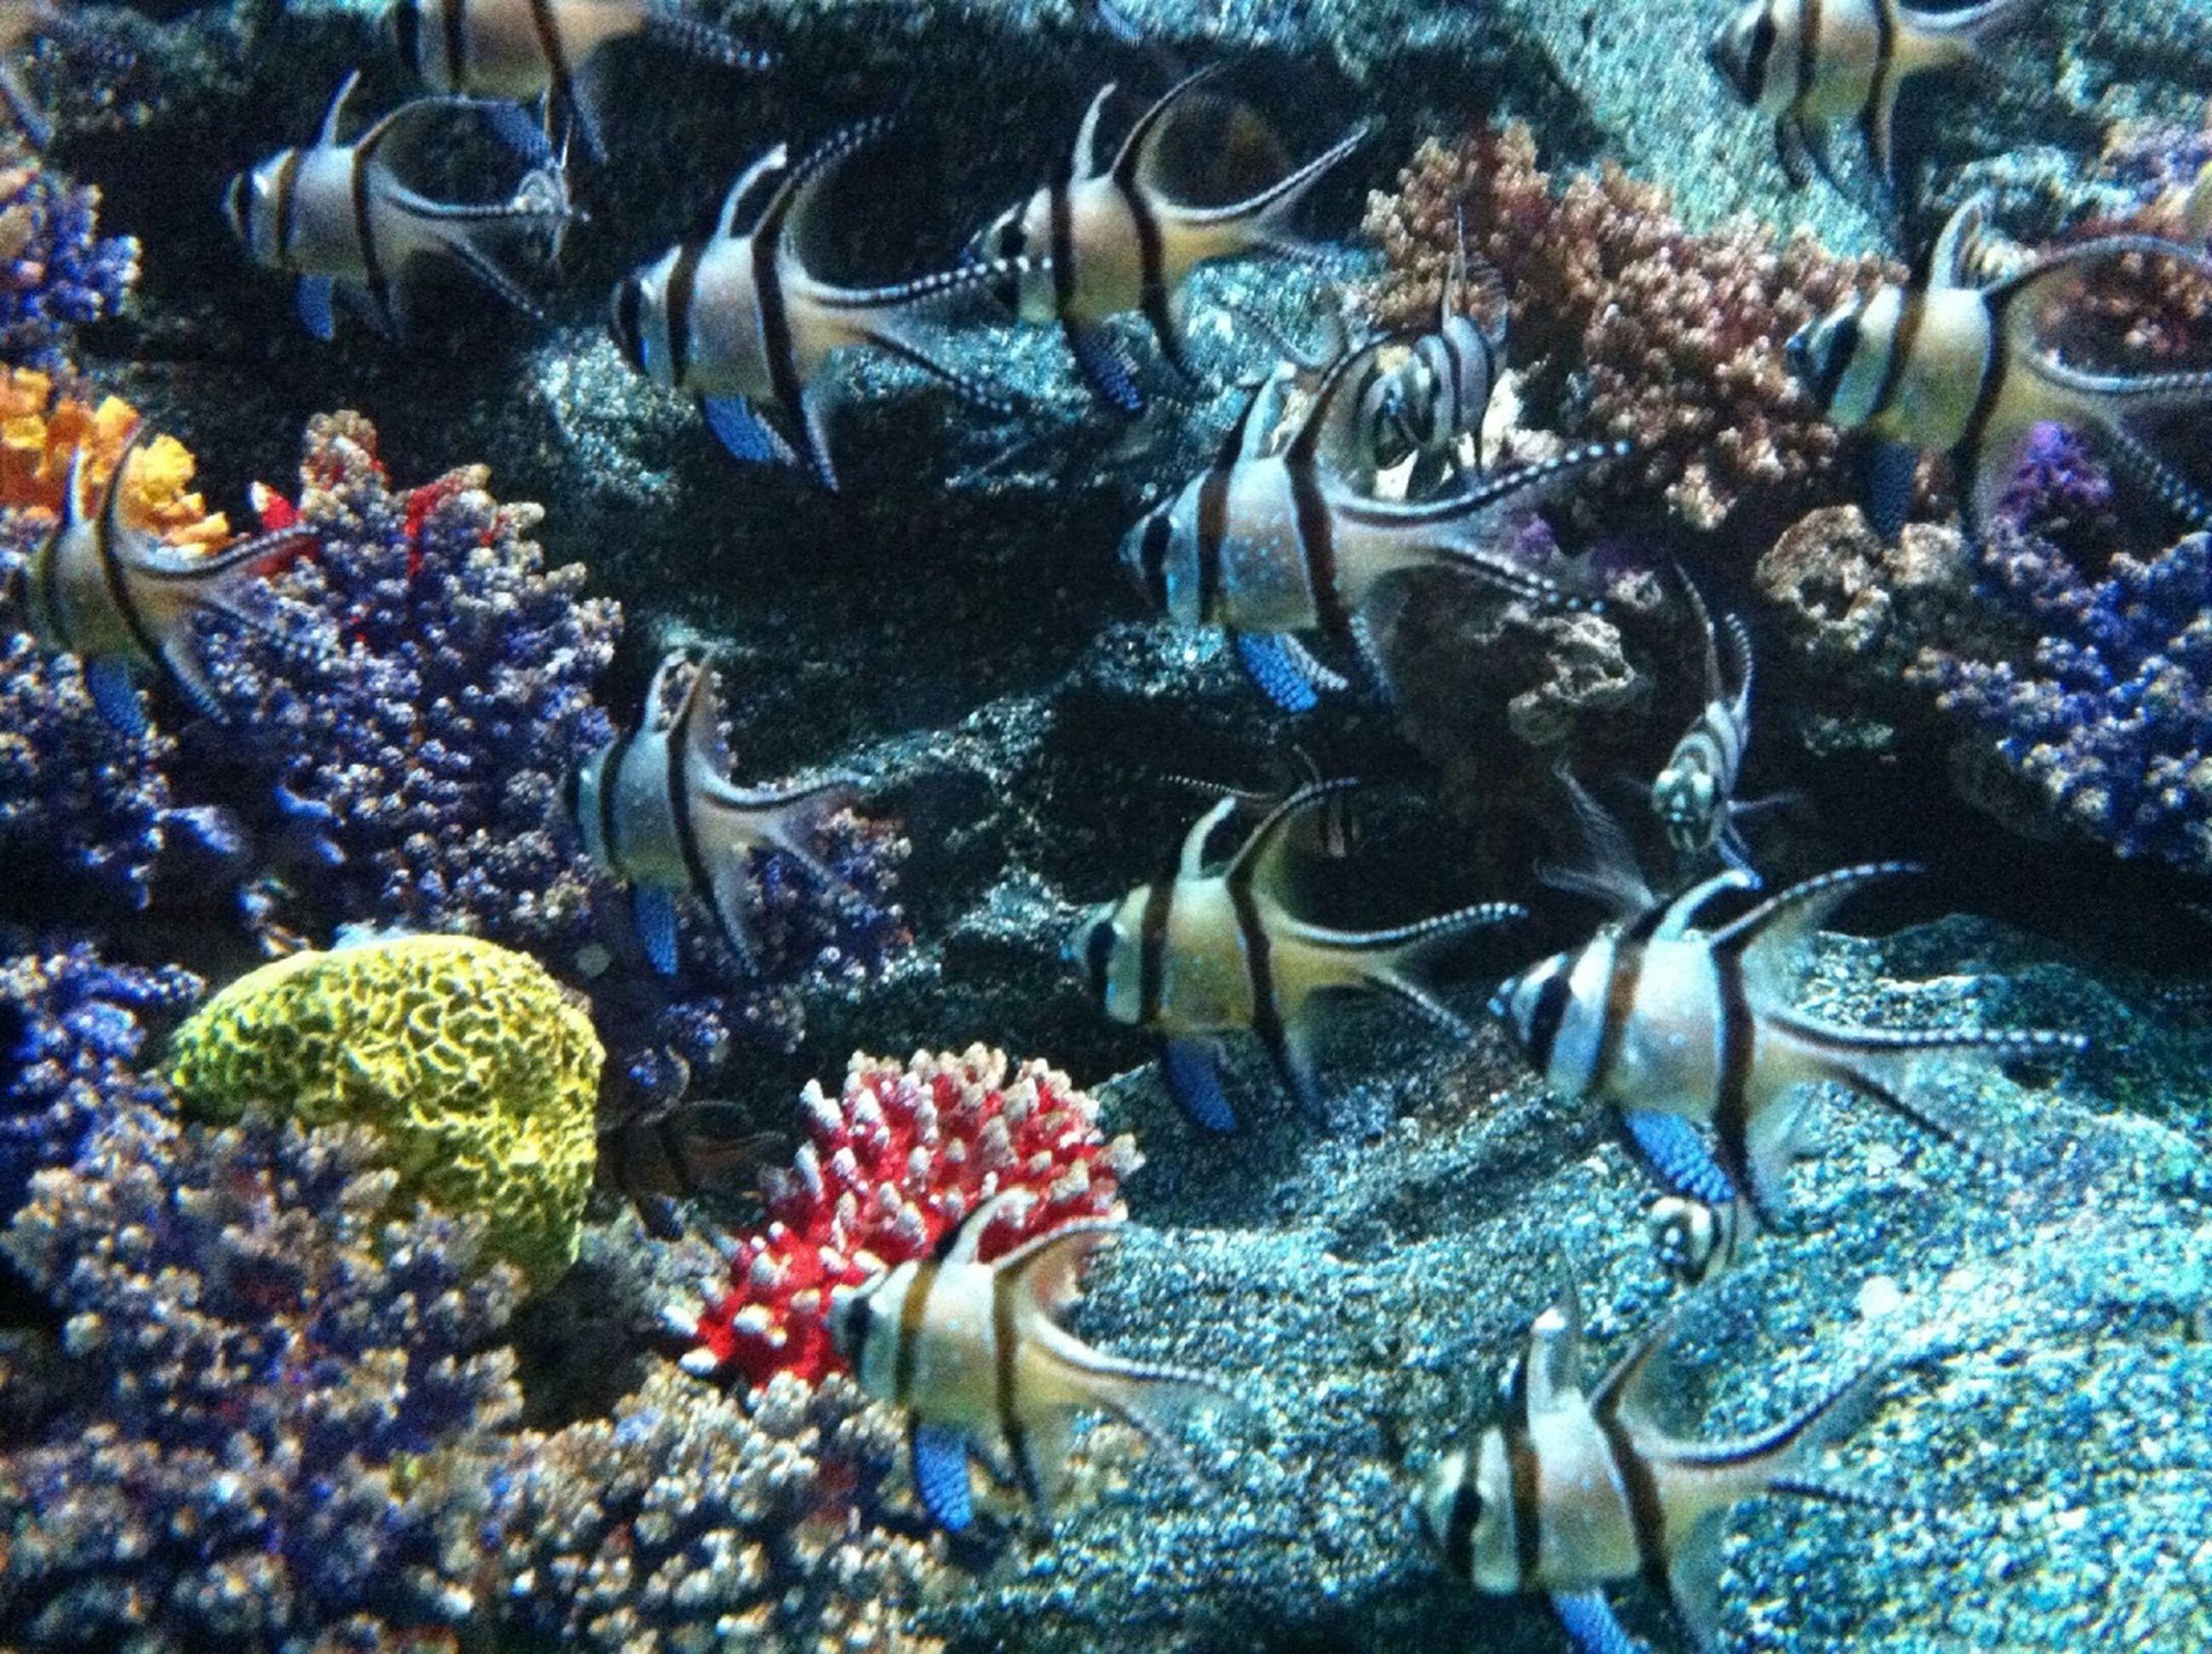 fish, sea life, animal themes, underwater, water, swimming, undersea, coral, wildlife, animals in the wild, high angle view, school of fish, abundance, nature, aquarium, sea, variation, no people, medium group of animals